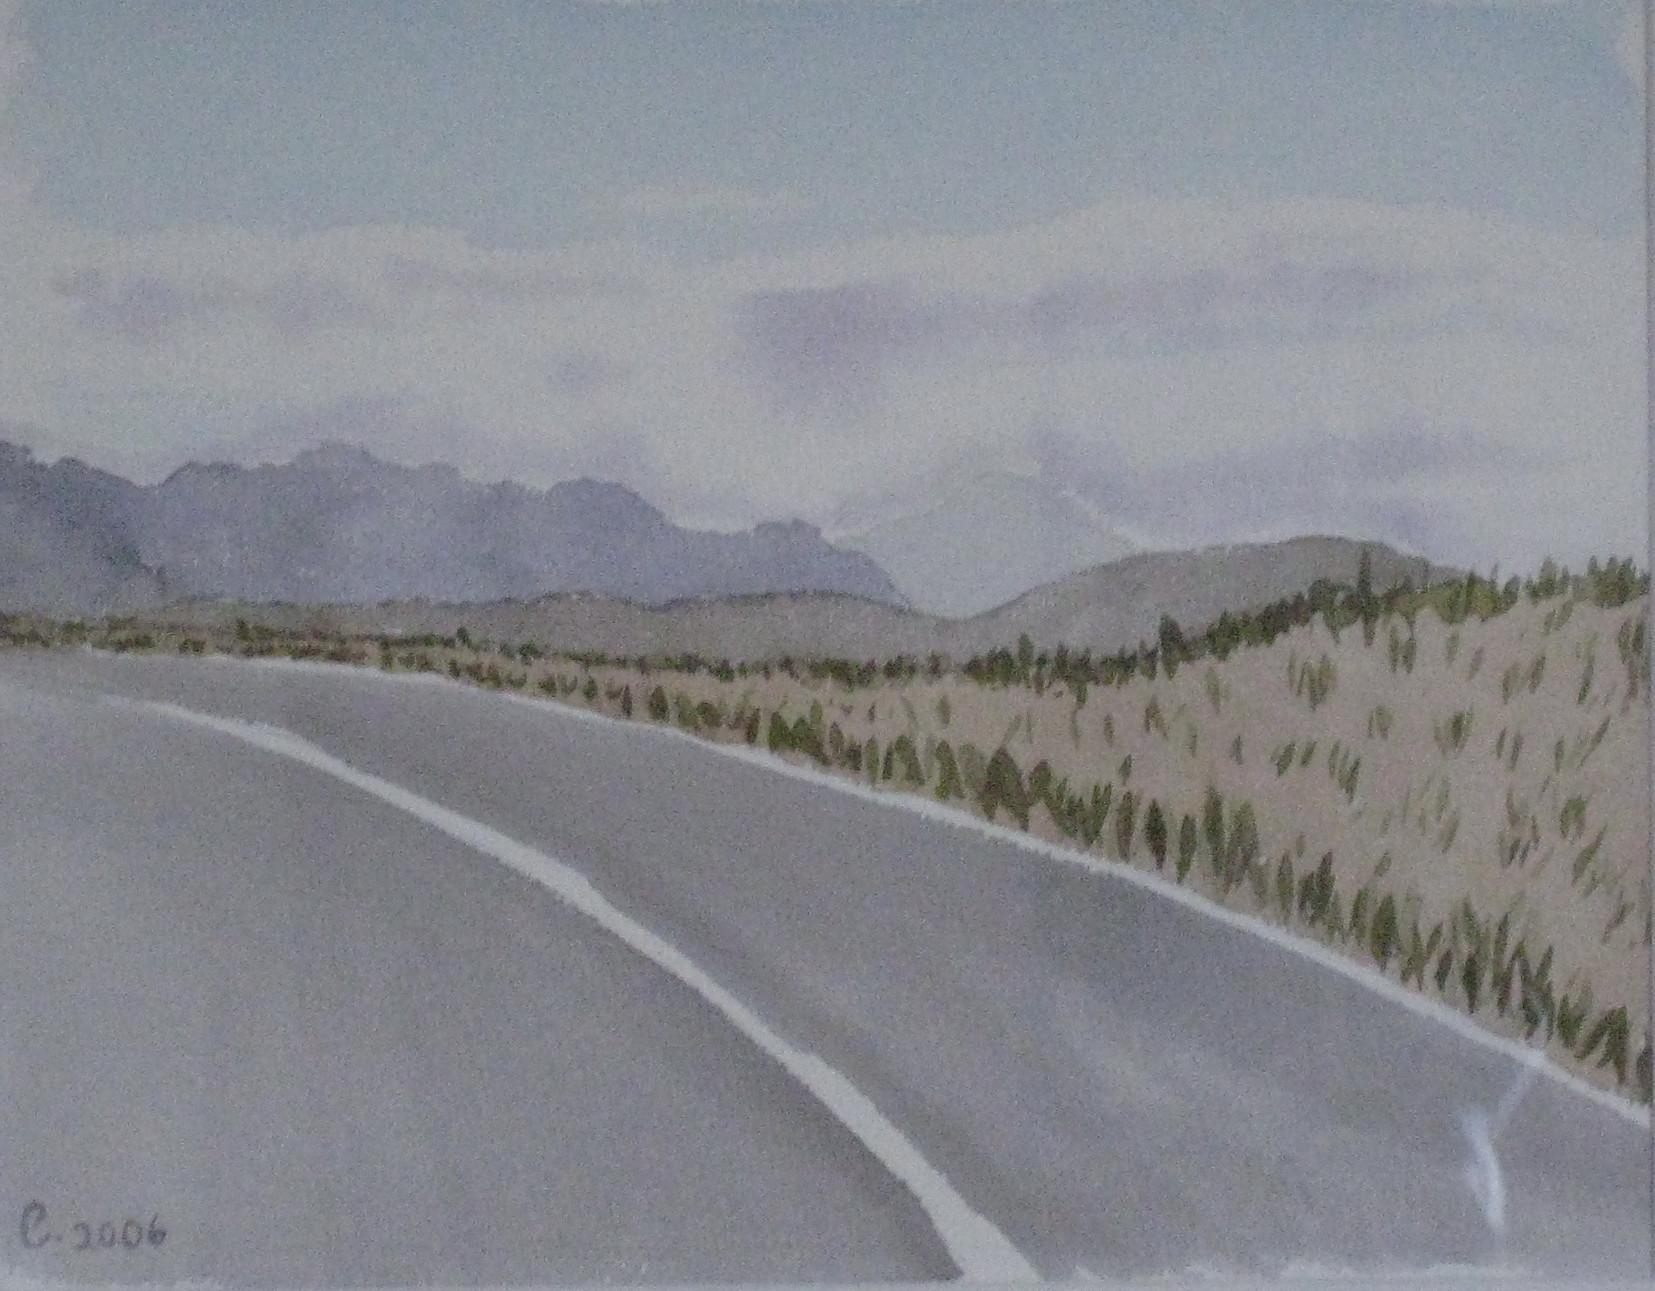 California Desert Road